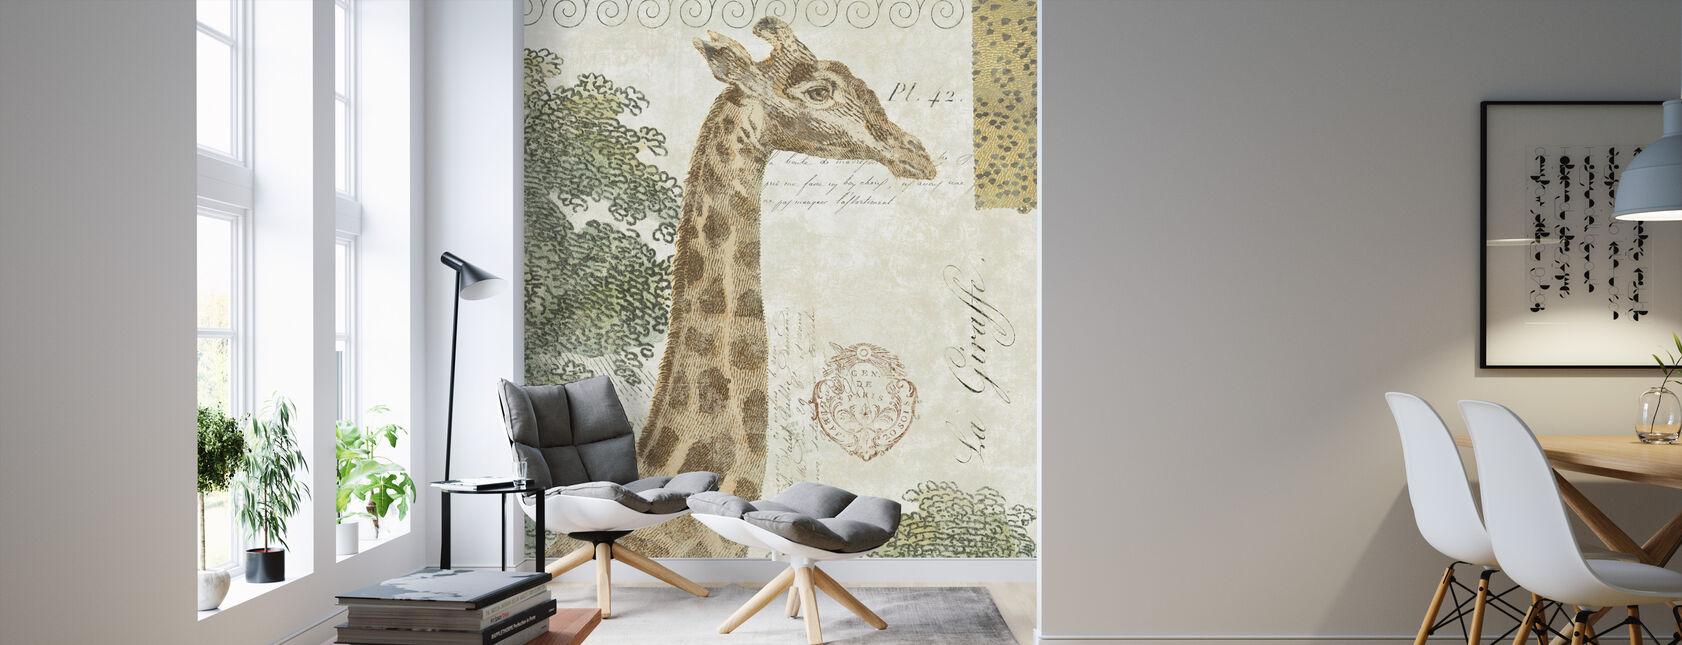 La Giraffe - Tapet - Stue